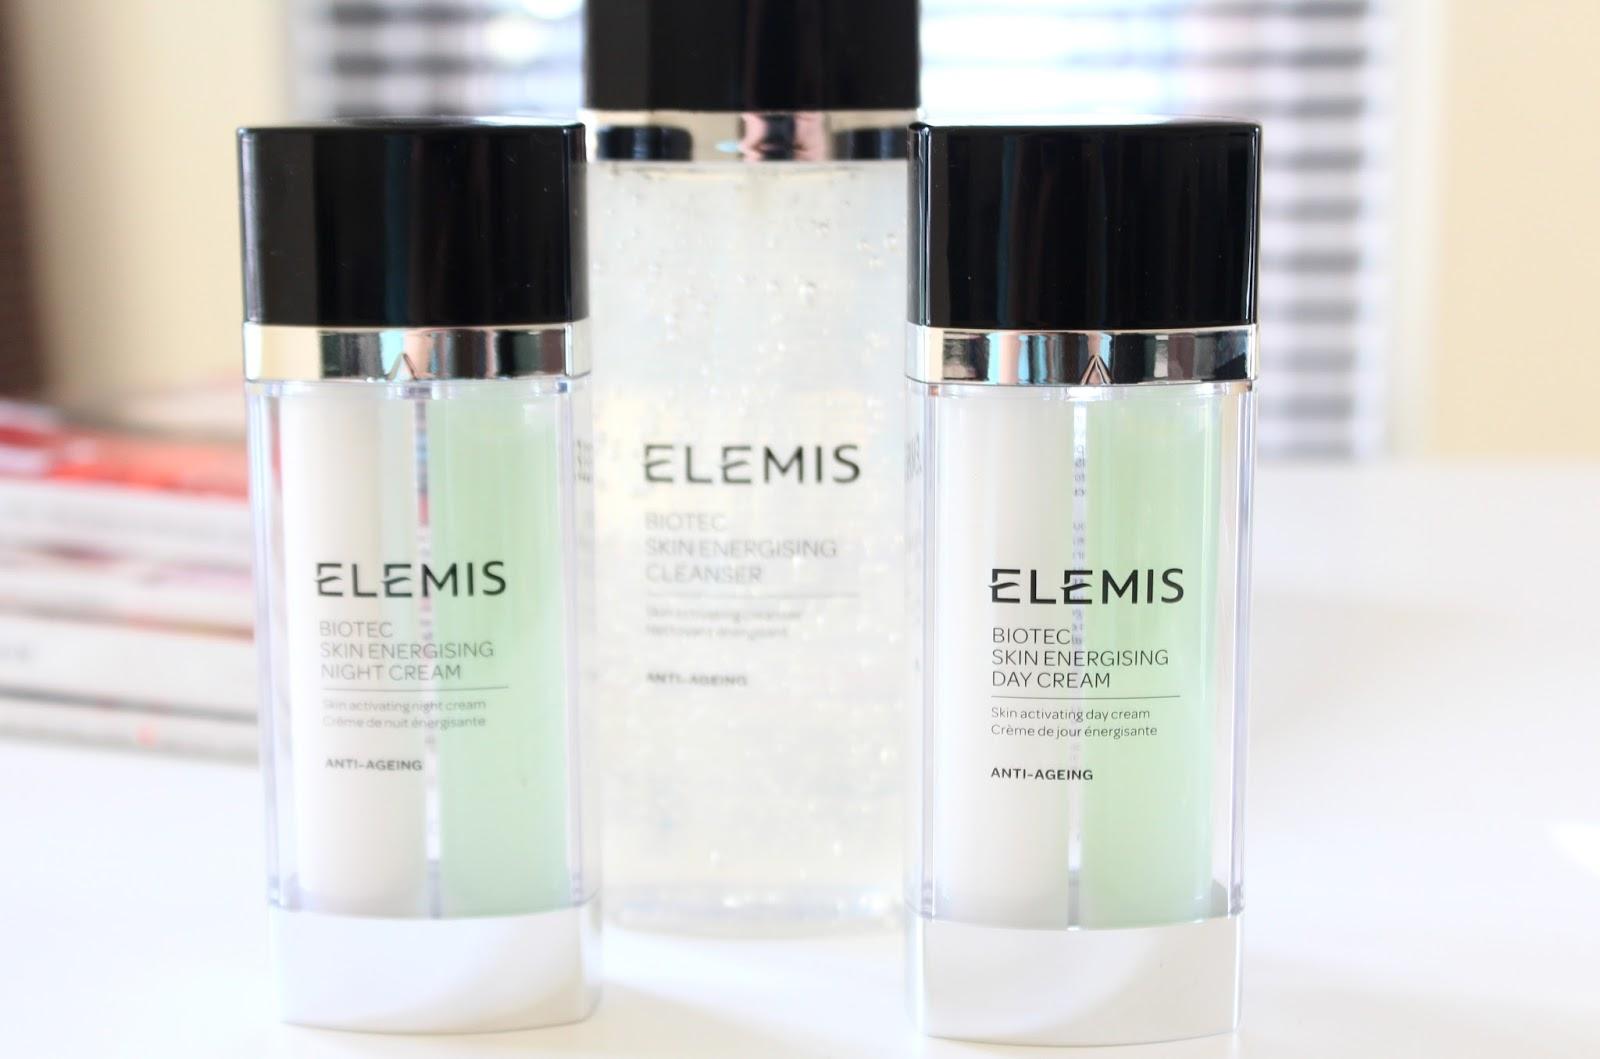 Elemis Biotec Skin Range